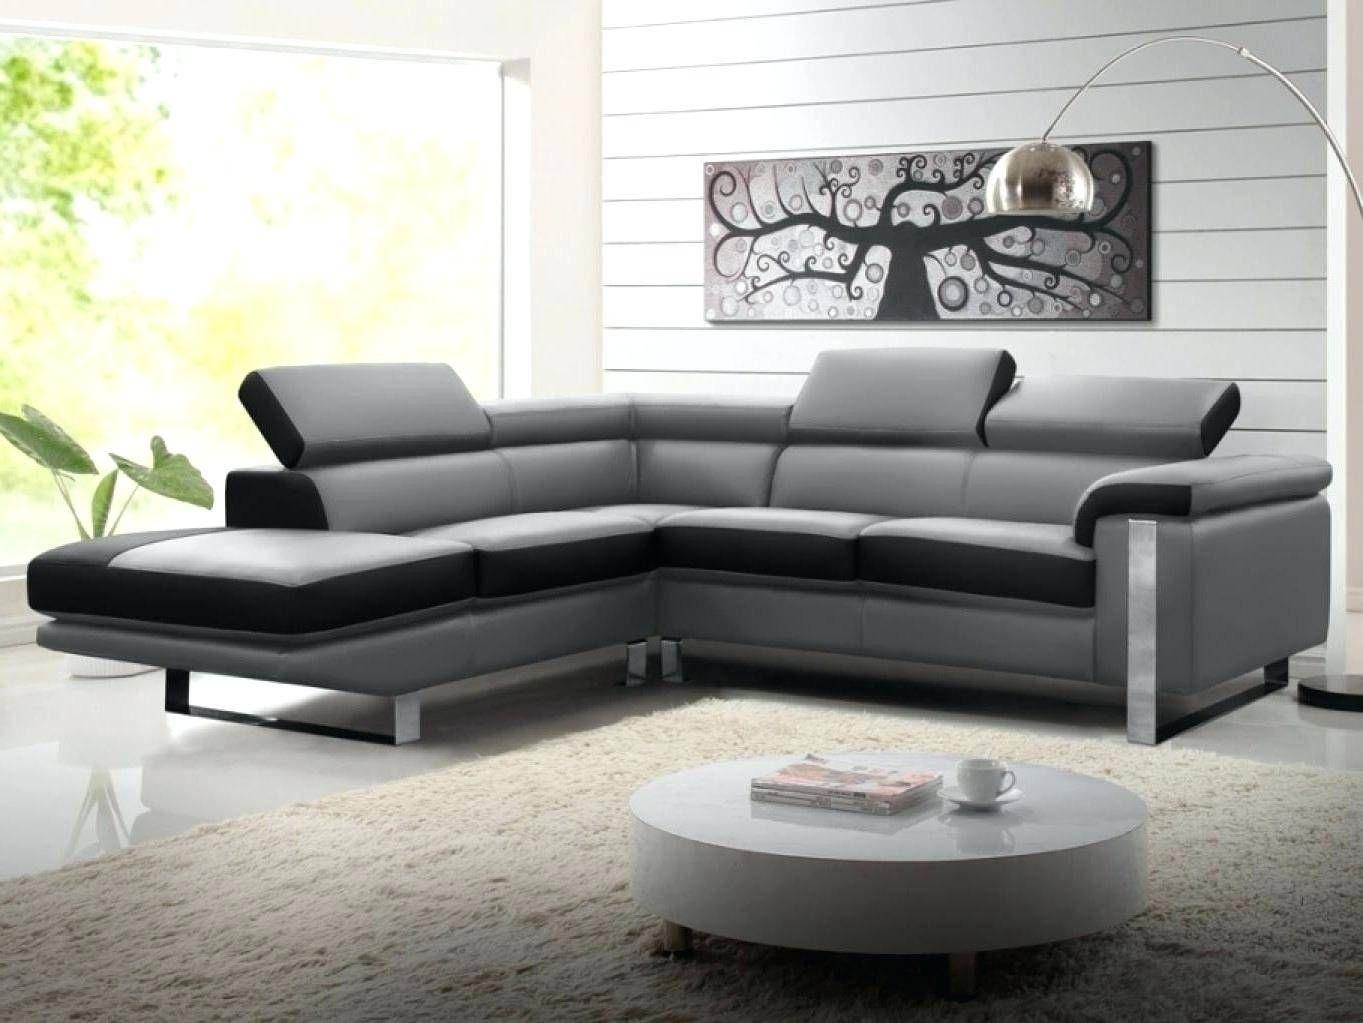 Canape Cuir Occasion Le Bon Coin Ides De Le Bon Coin Canape Doccasion Galerie Dimages In 2020 Sofa Design Home Decor Modern Couch